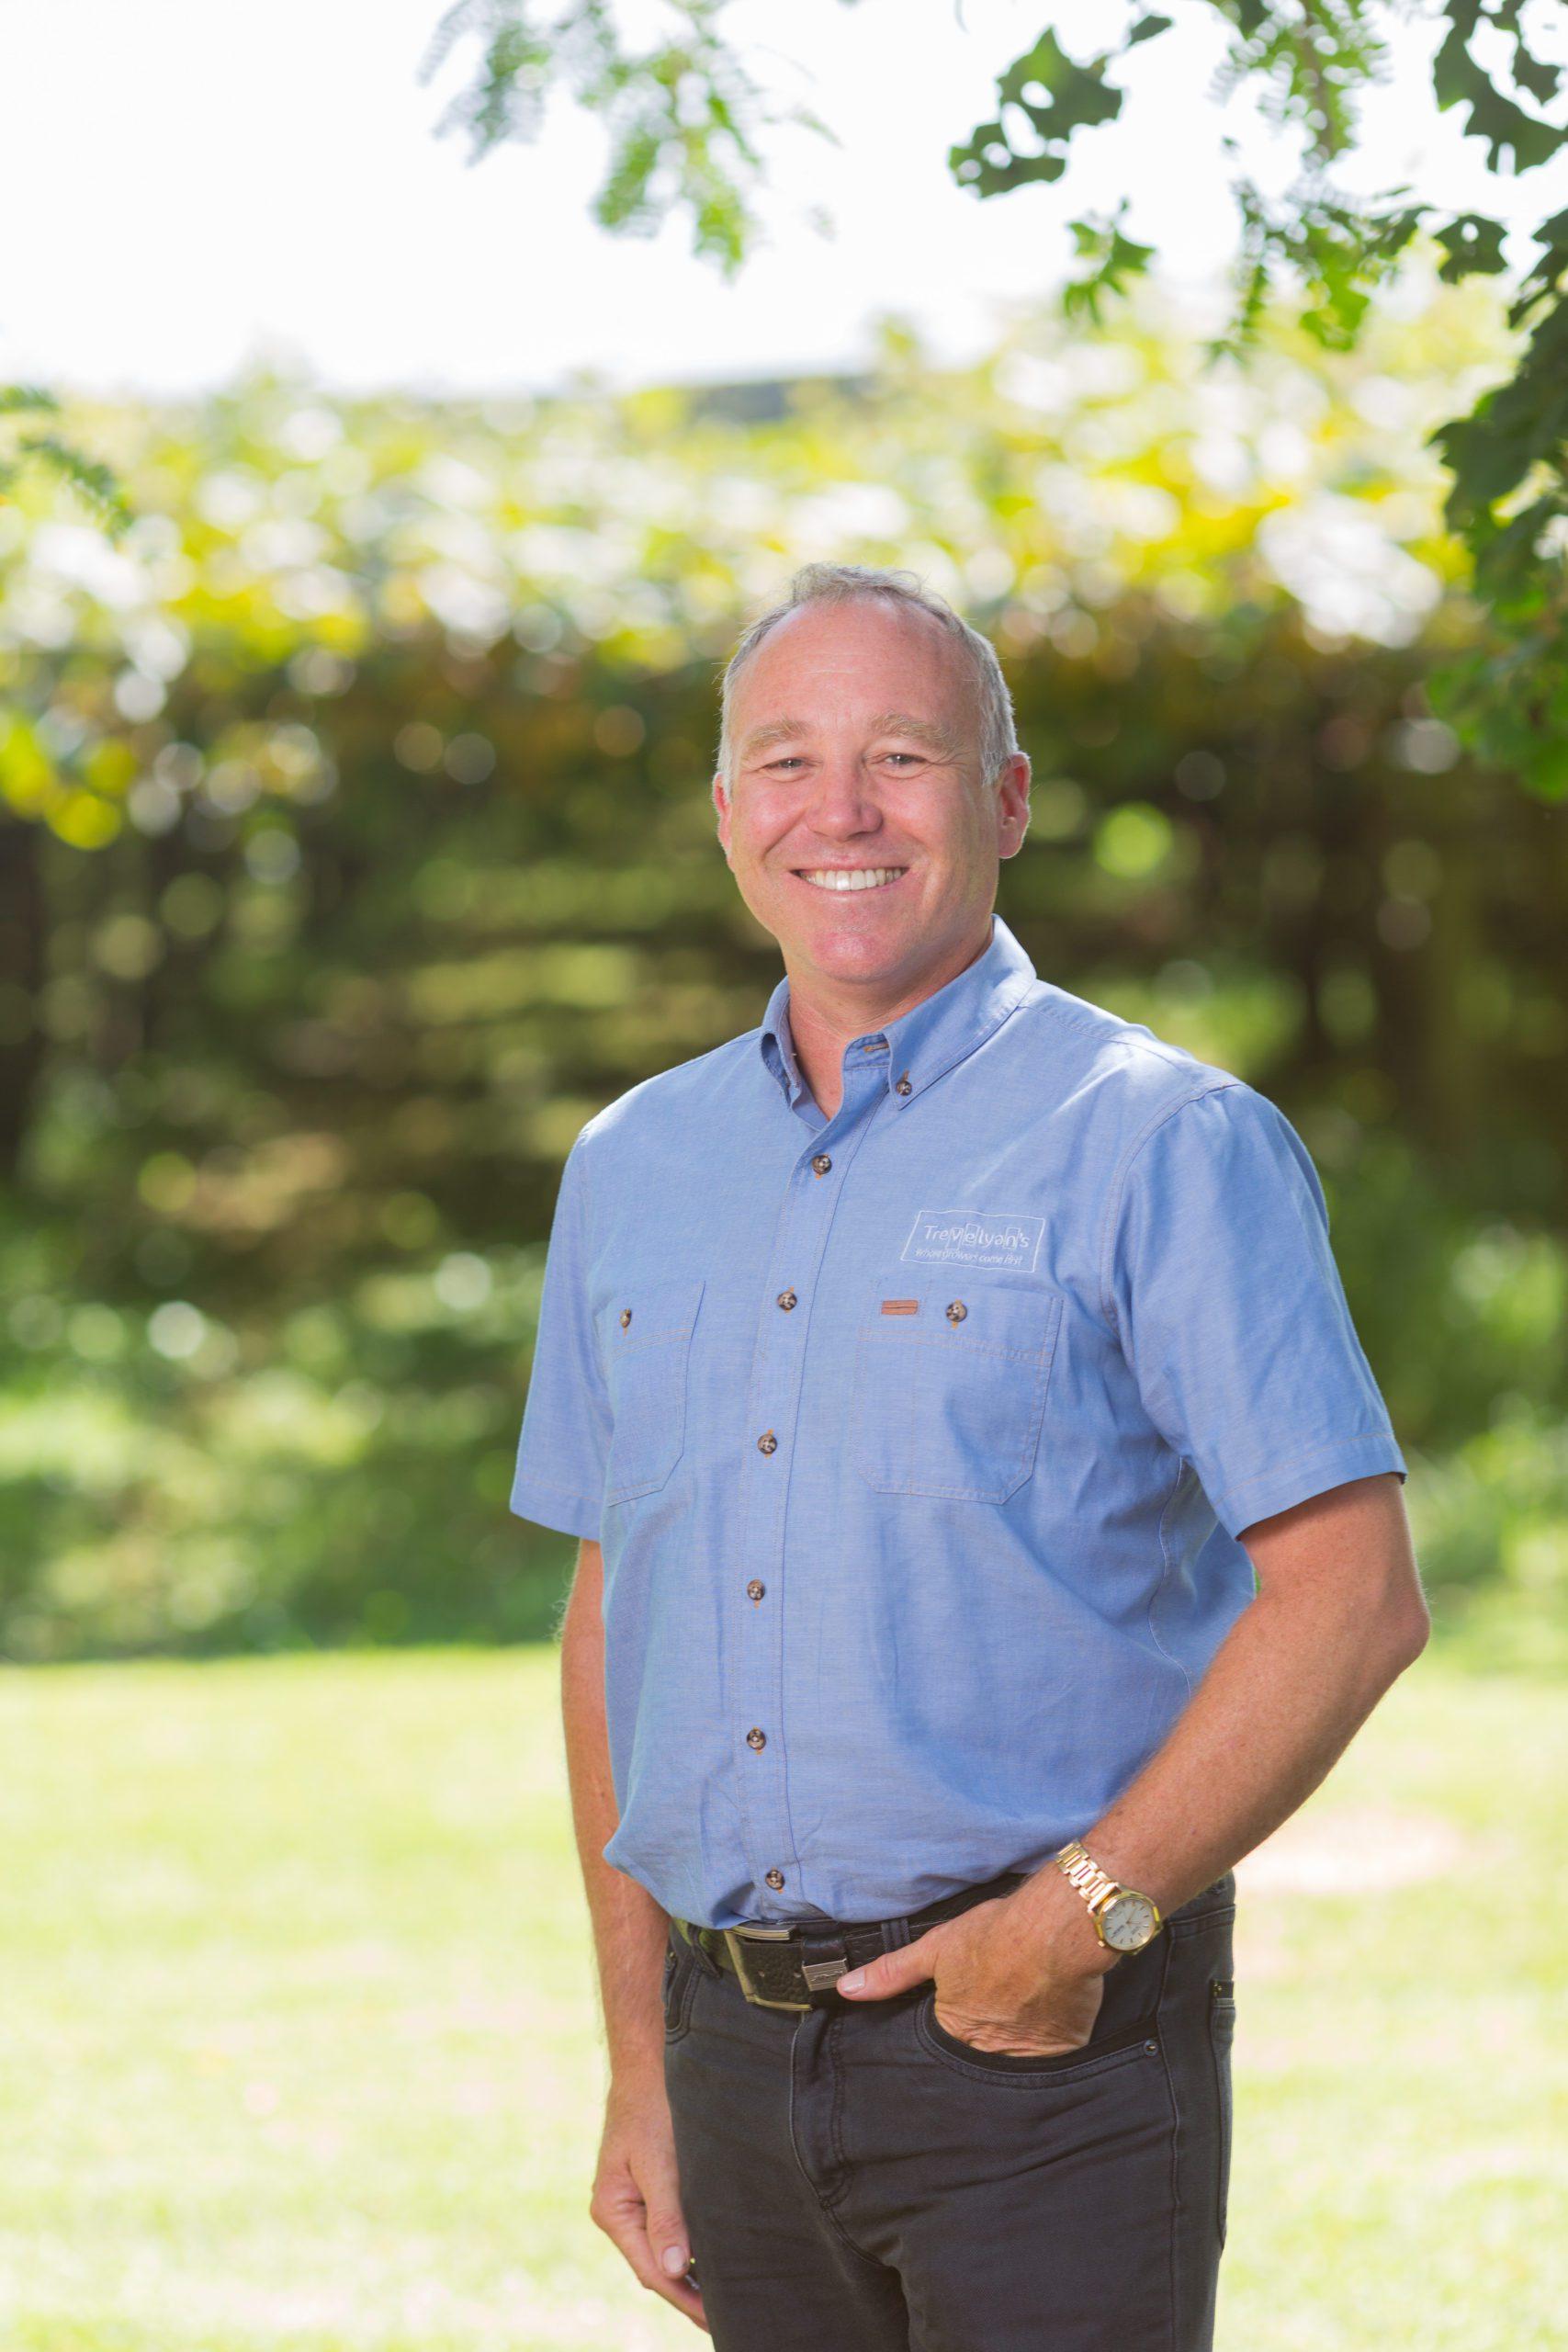 Marty Blake